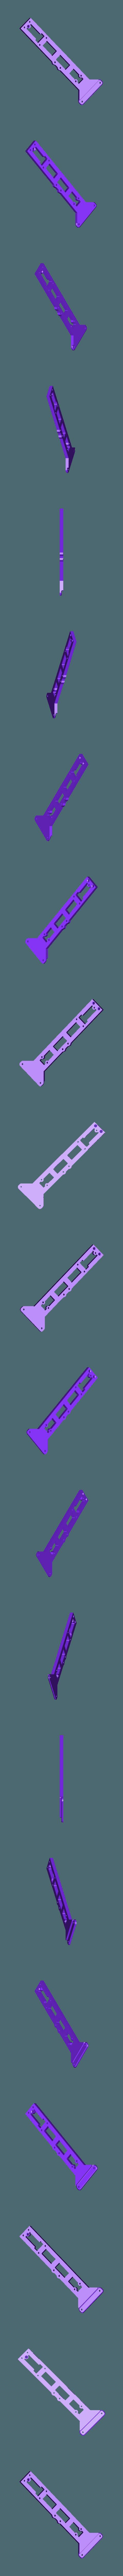 Up frame.STL Download free STL file 1/10 RC 4WD TRUGGY BT250.2 • 3D printer object, ivnssnn